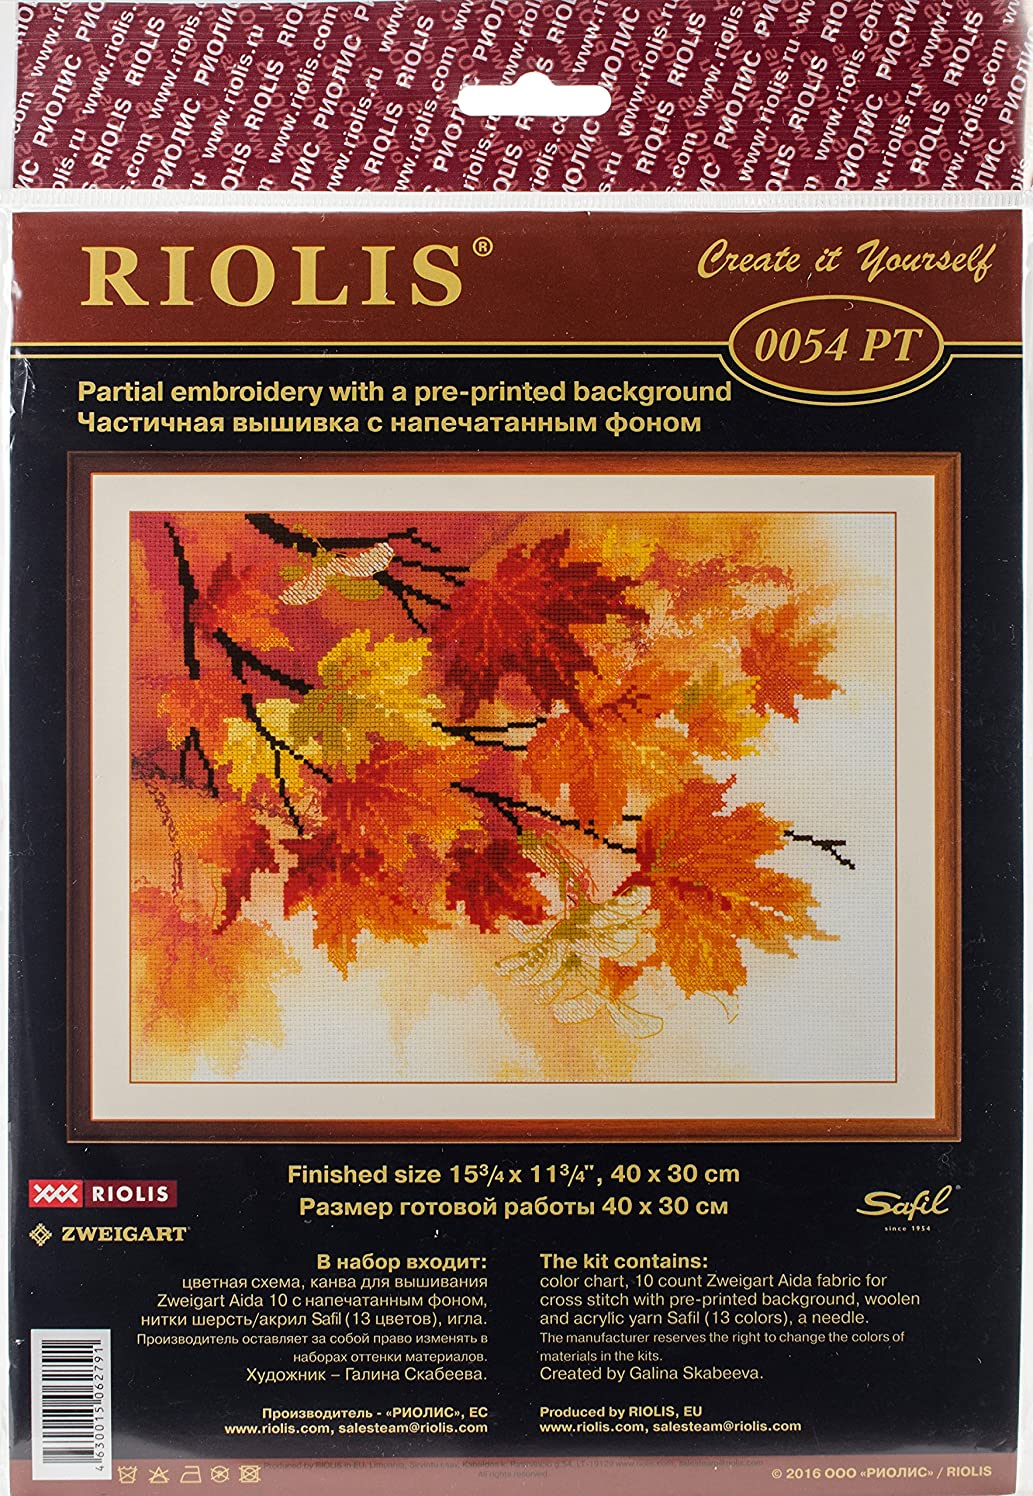 RIOLIS R0054PT Stamped Cross Stitch Kit 15.75